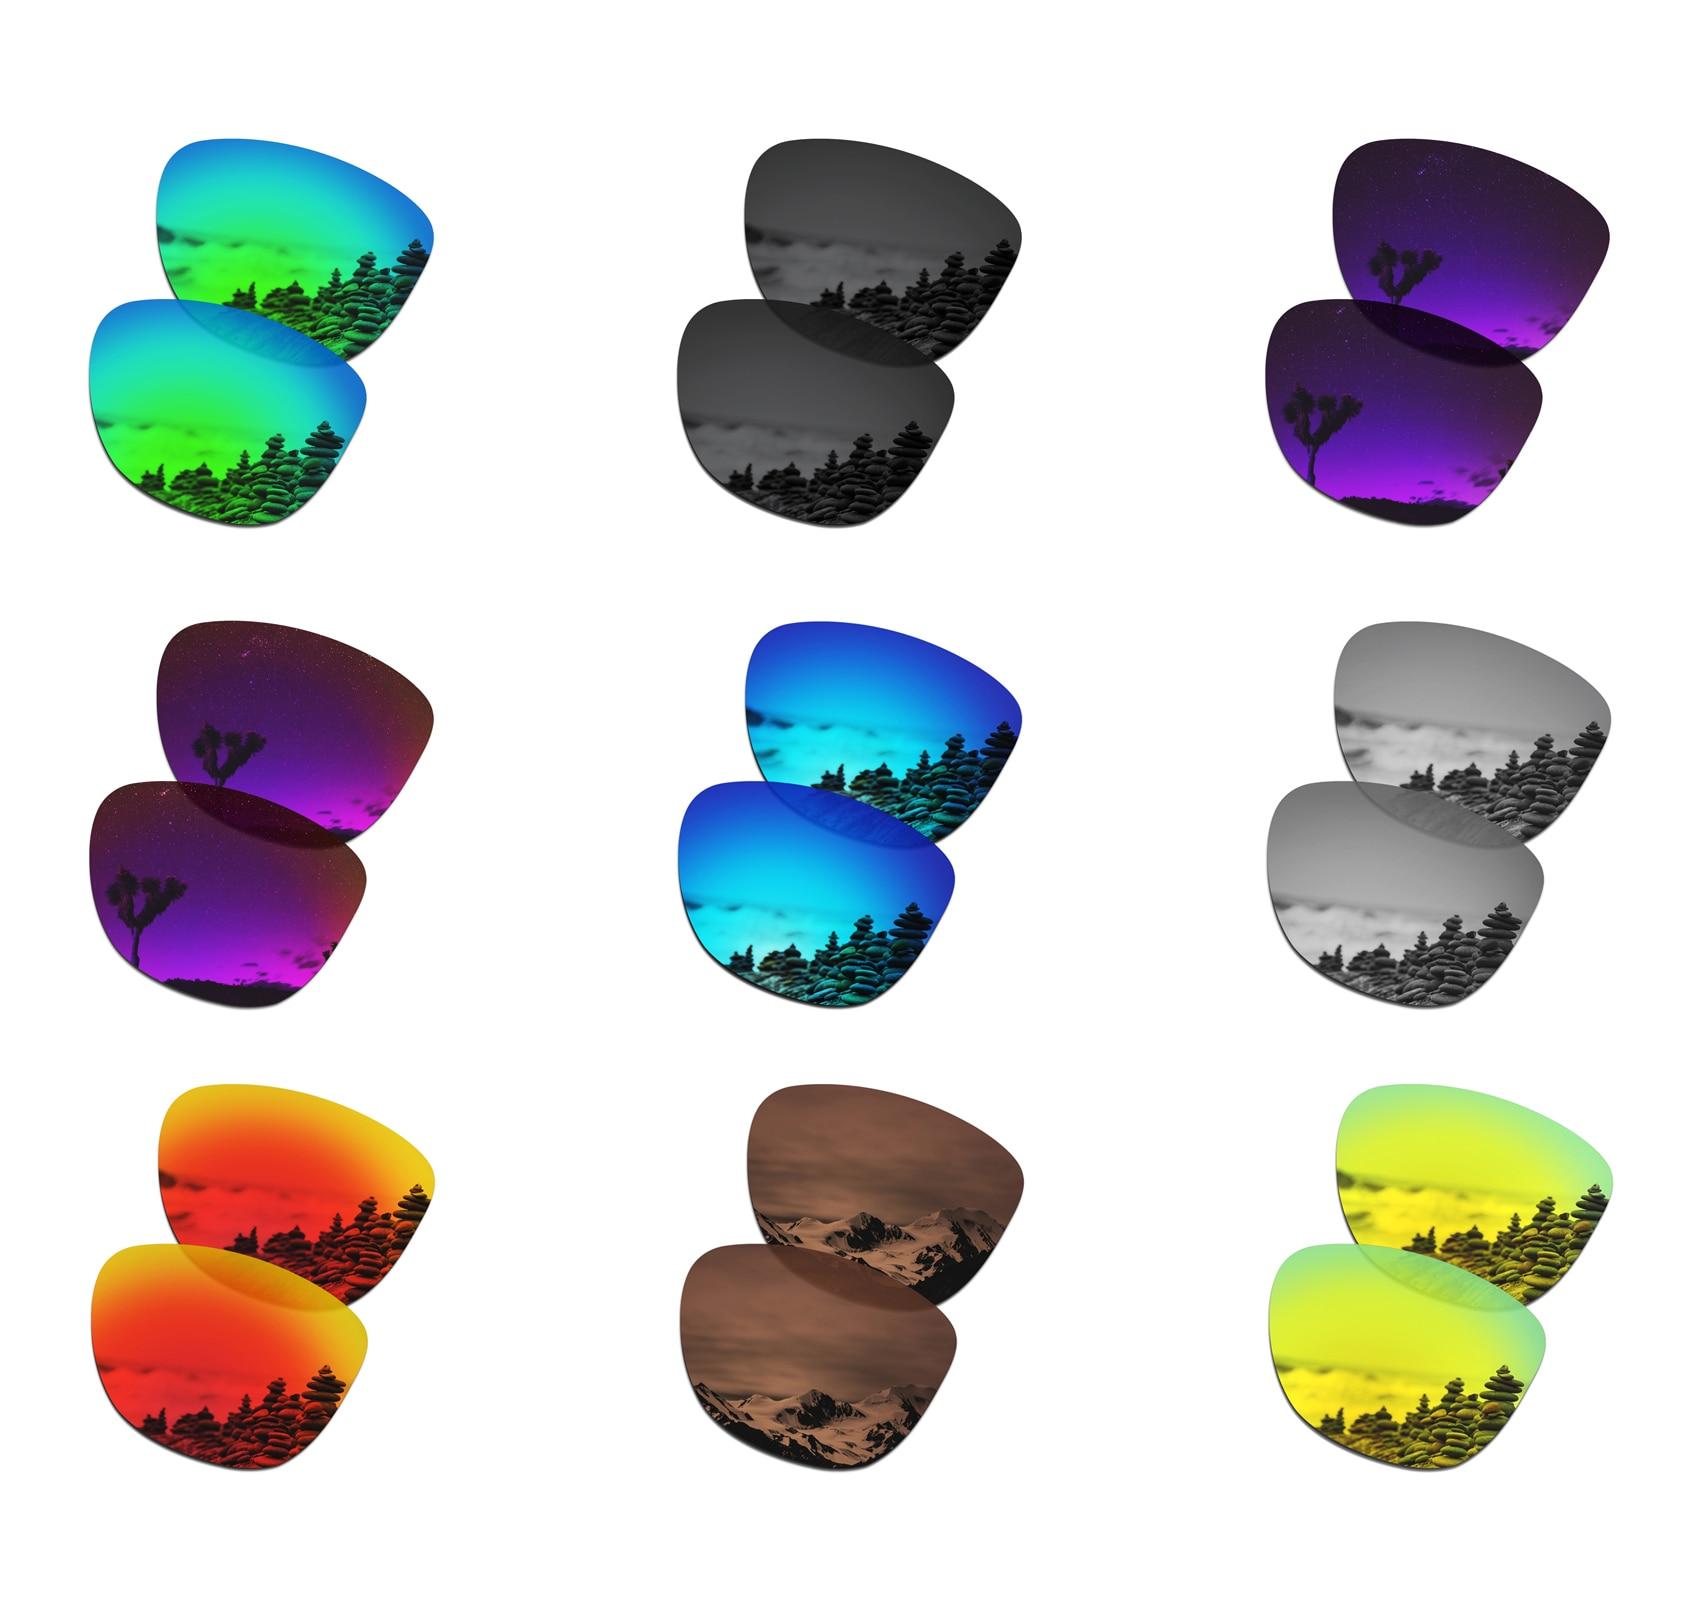 SmartVLT Polarized Replacement Lenses for Oakley Frogskins Sunglasses - Multiple Options